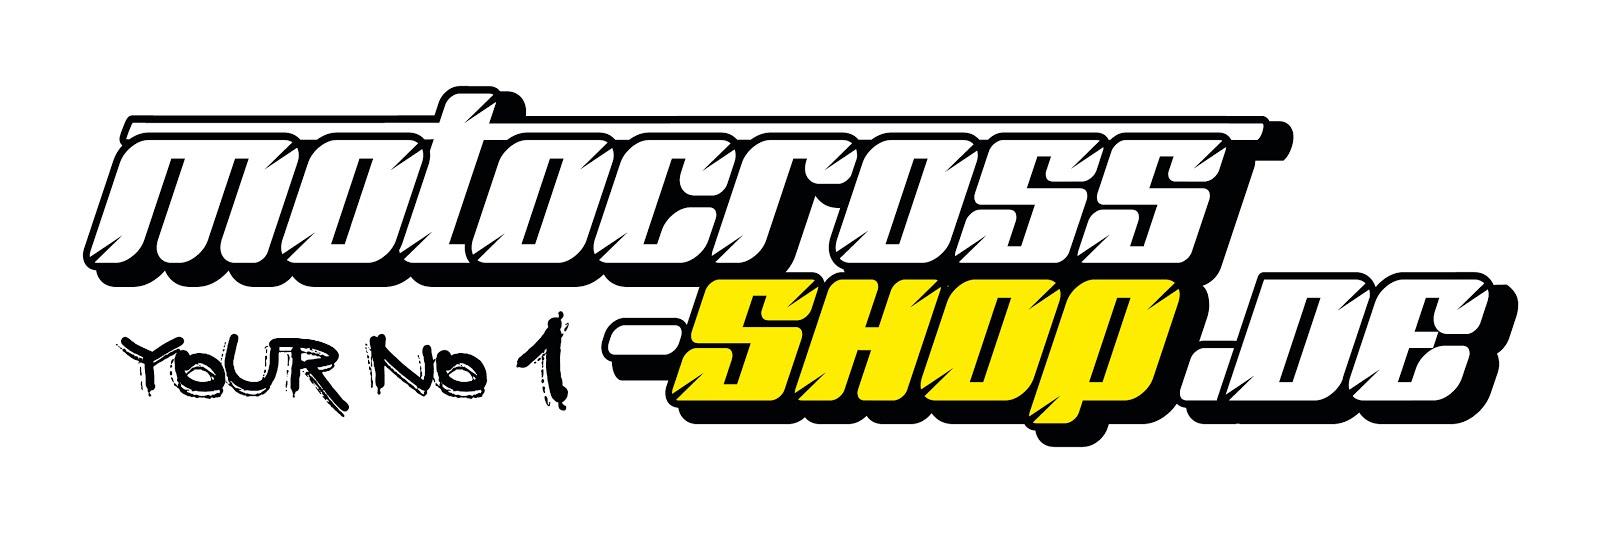 motocross-shop.de